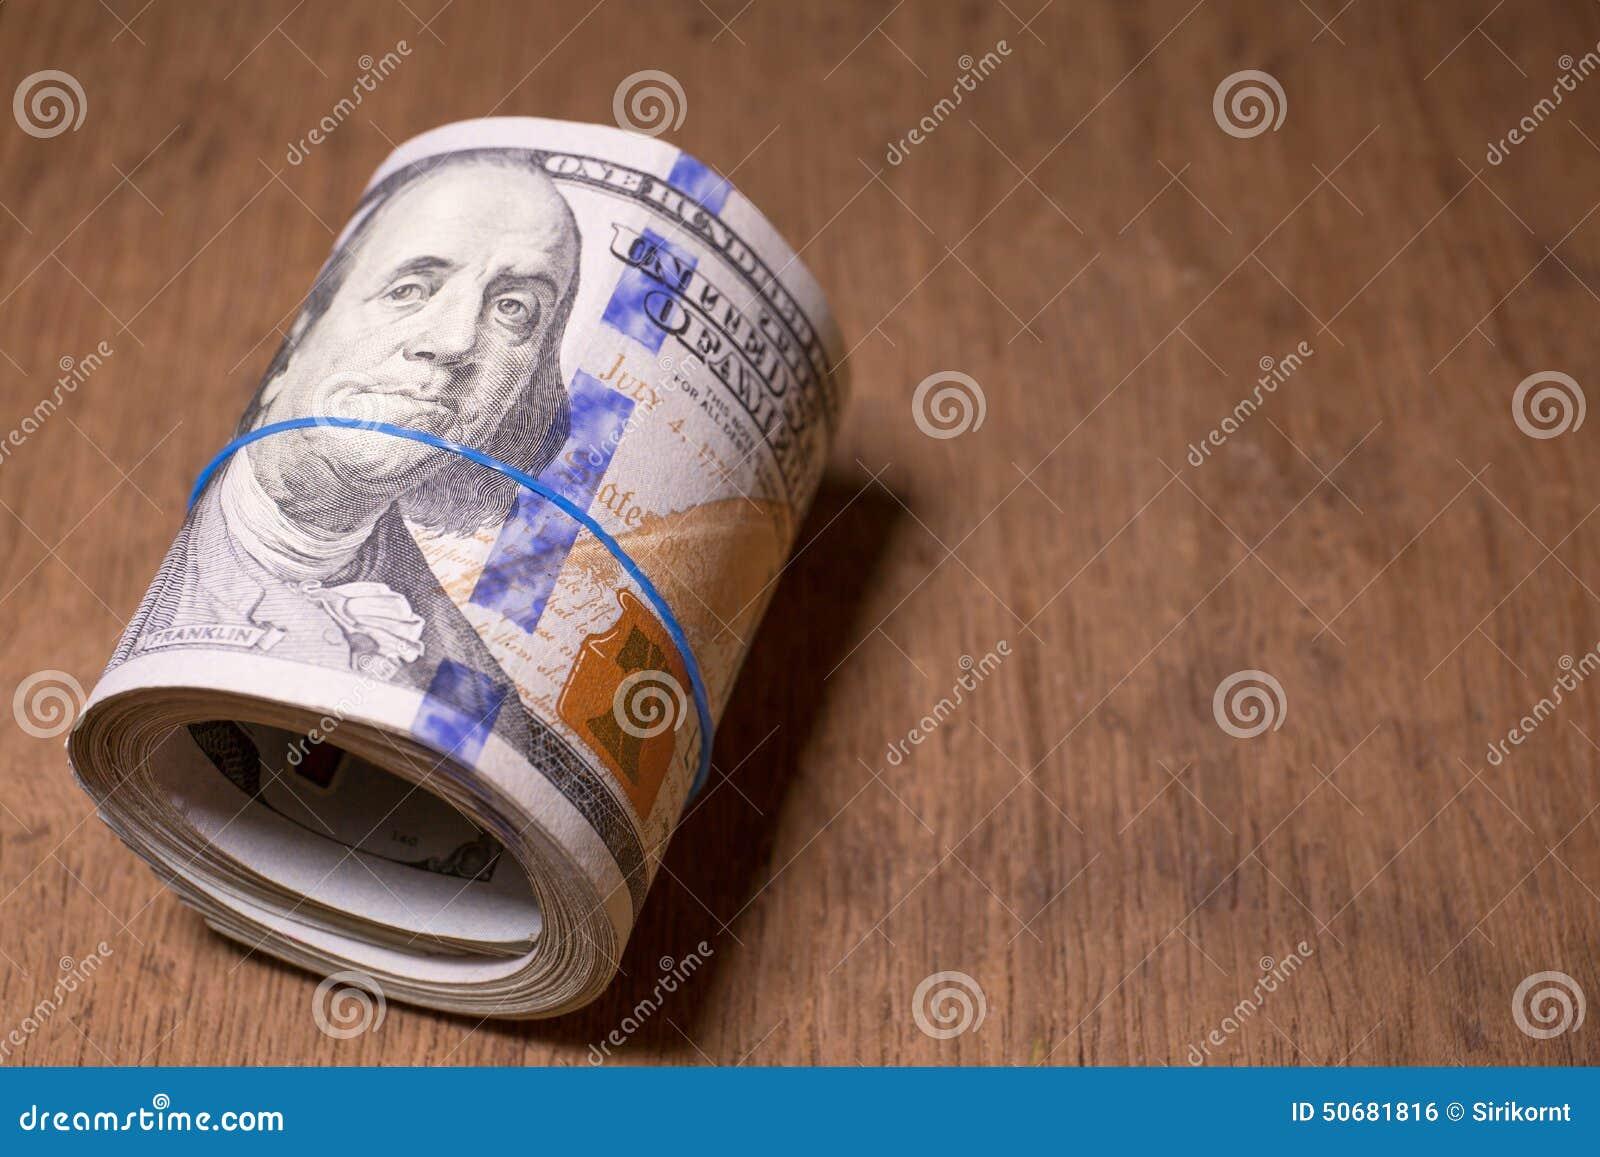 Download 一百元钞票卷 库存照片. 图片 包括有 bennie, 资金, 有选择性, 当前, 储蓄, 替换, 利润 - 50681816